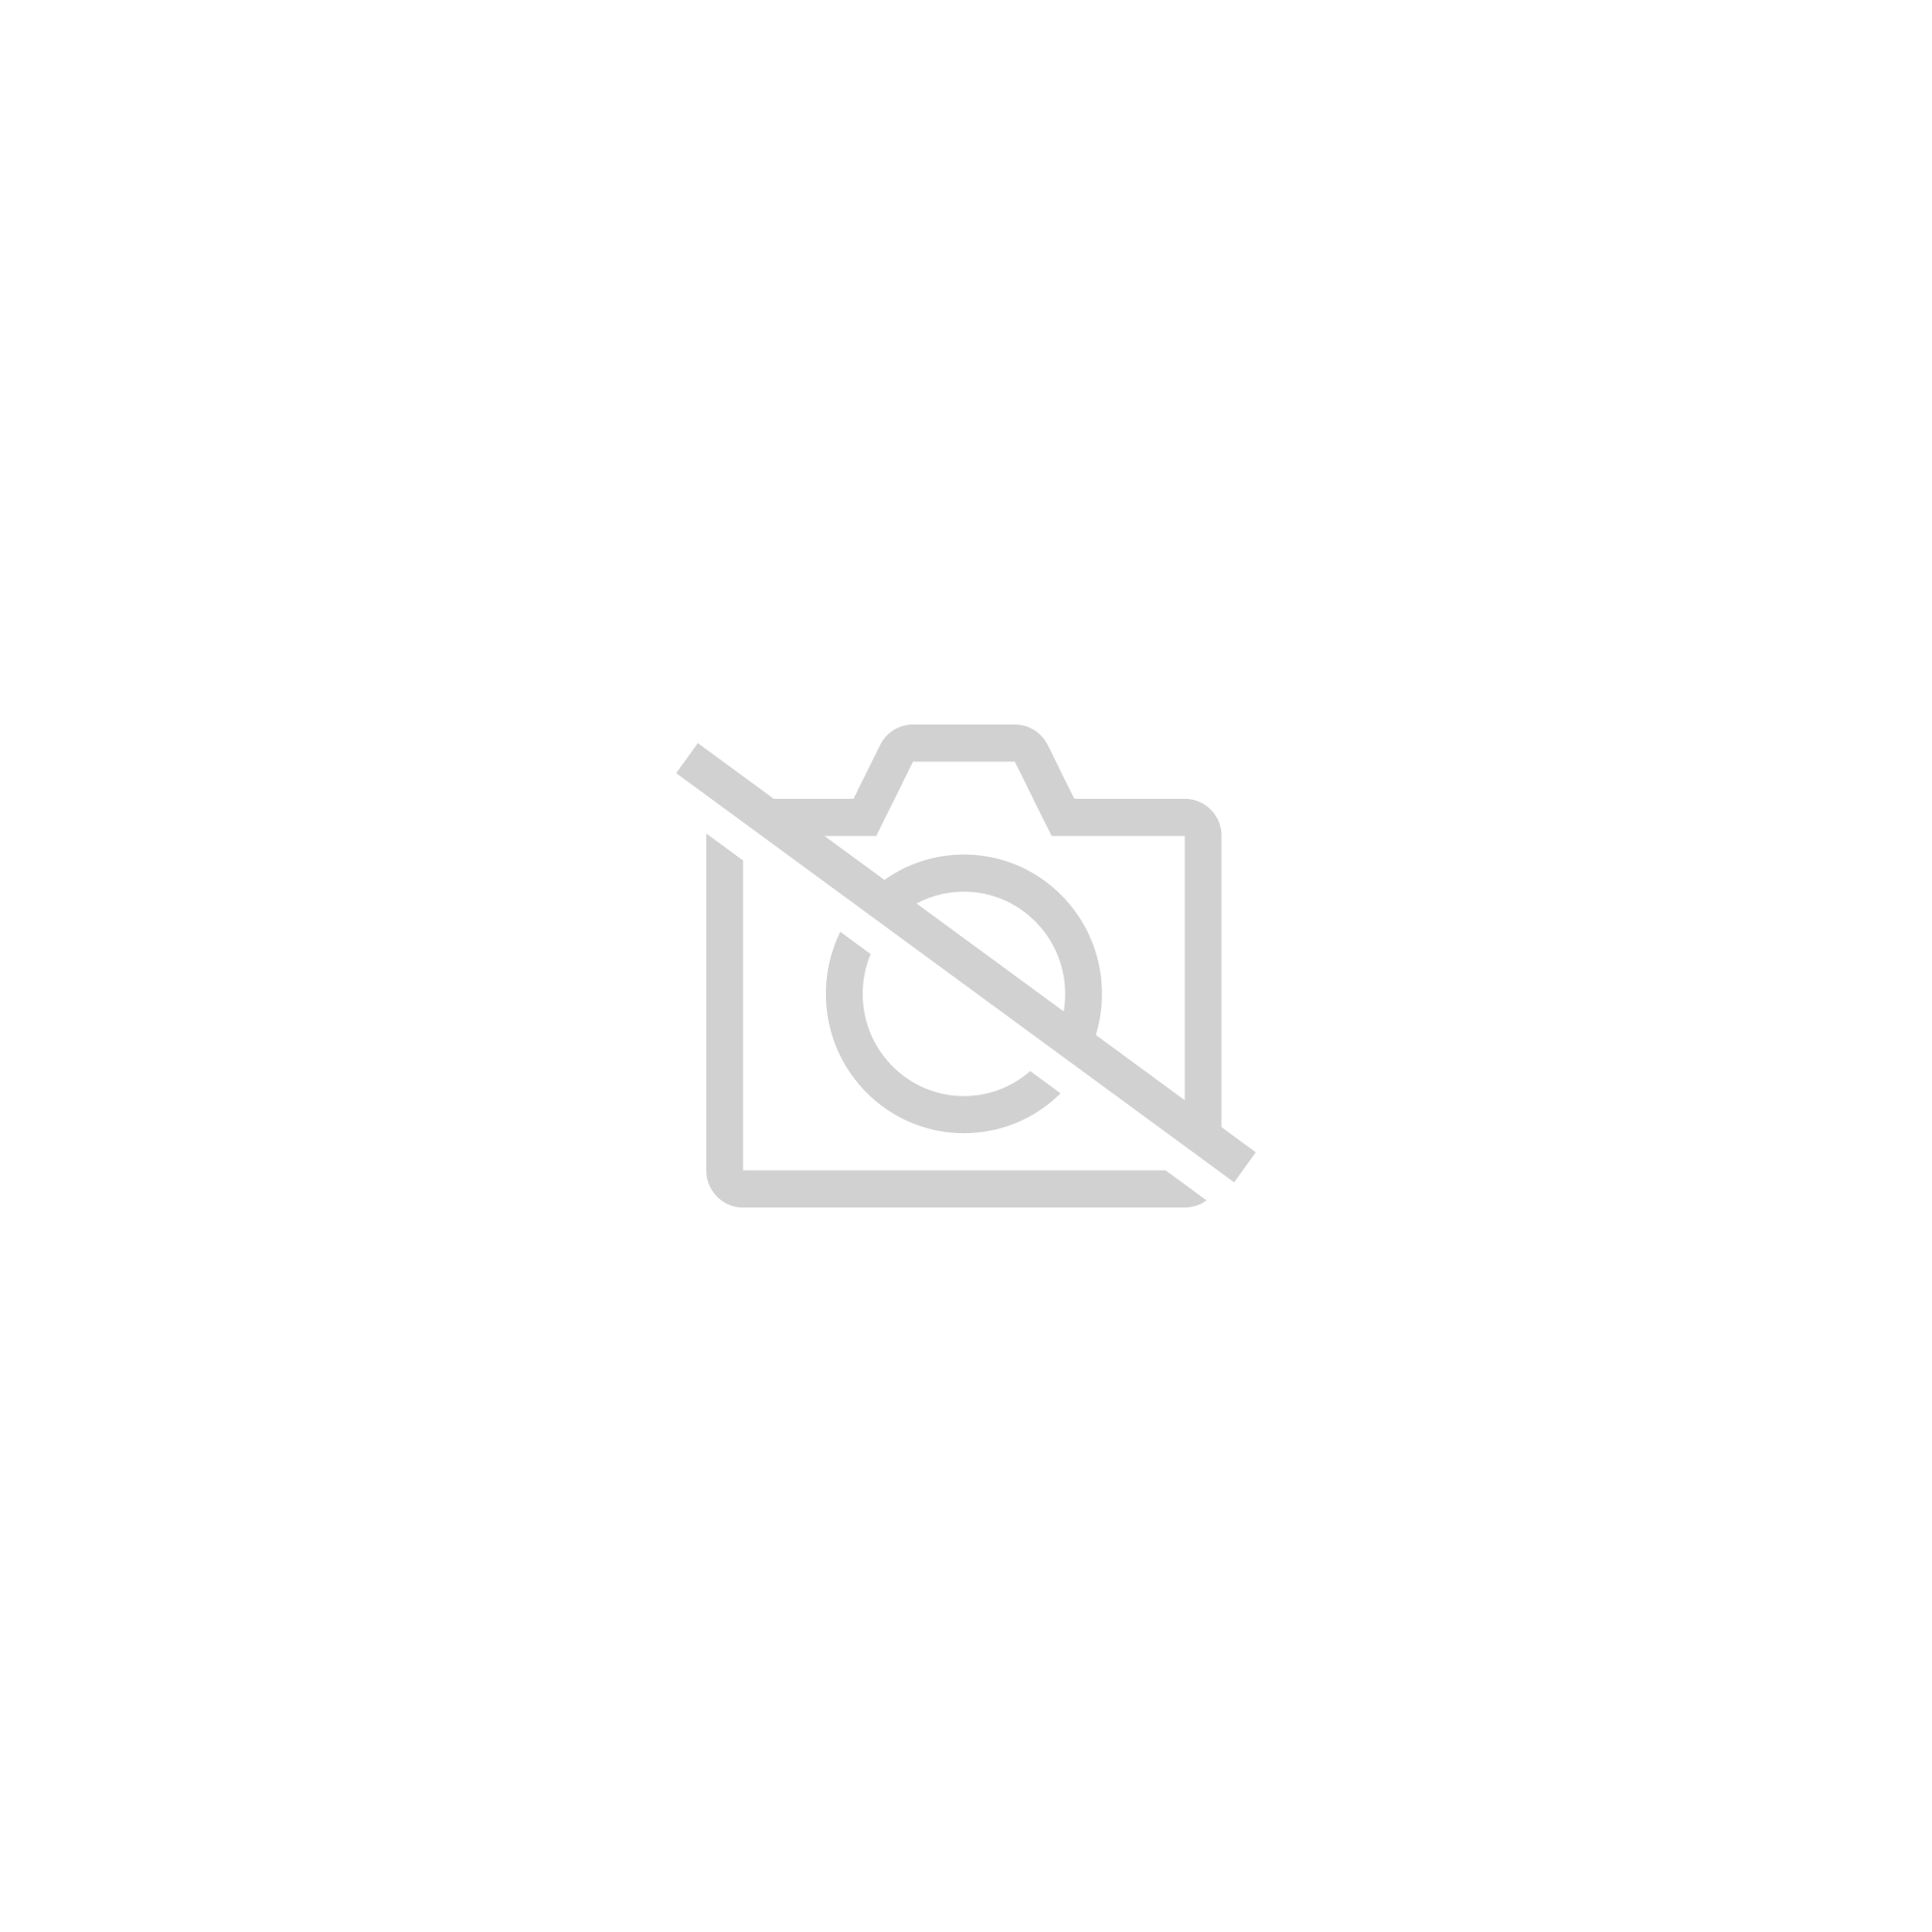 Agenda familial Mémoniak pocket 2018-2019